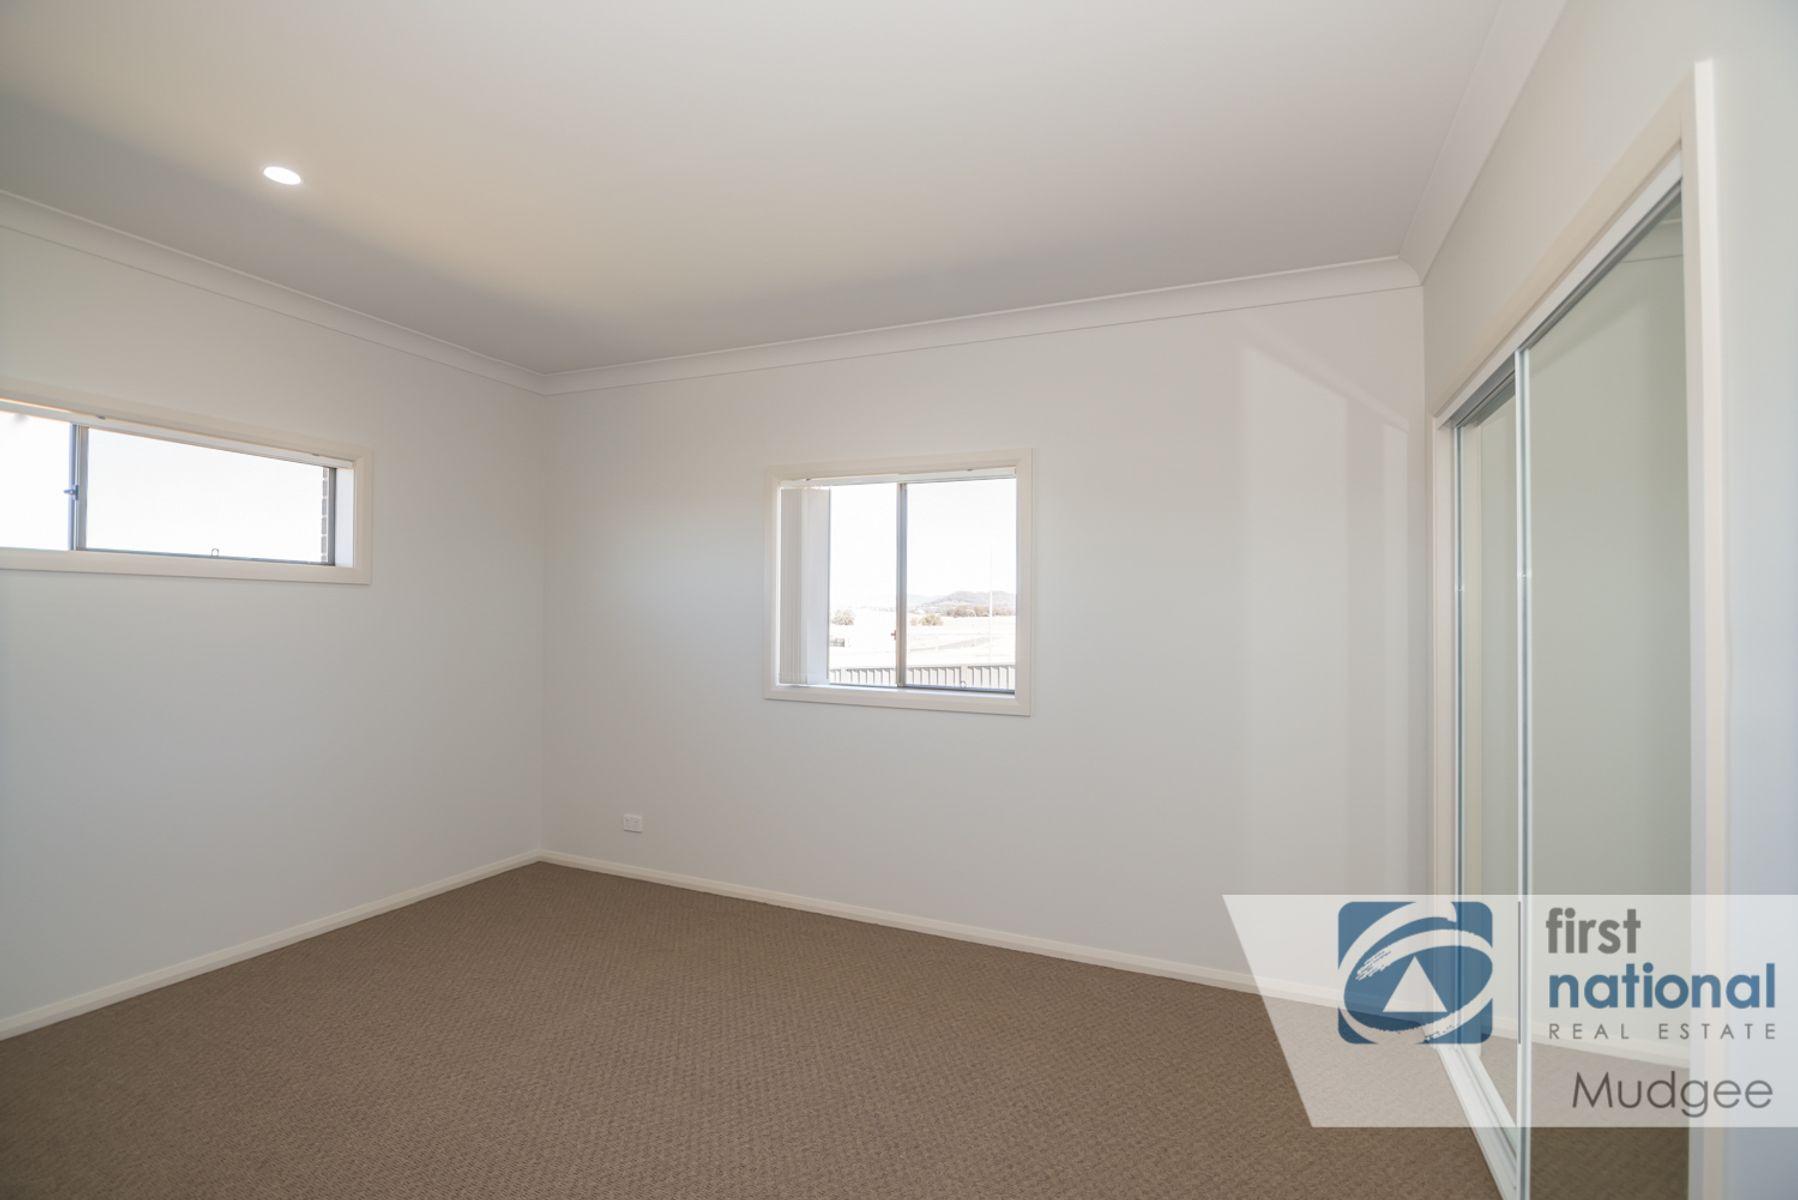 11 Hosking Street, Mudgee, NSW 2850